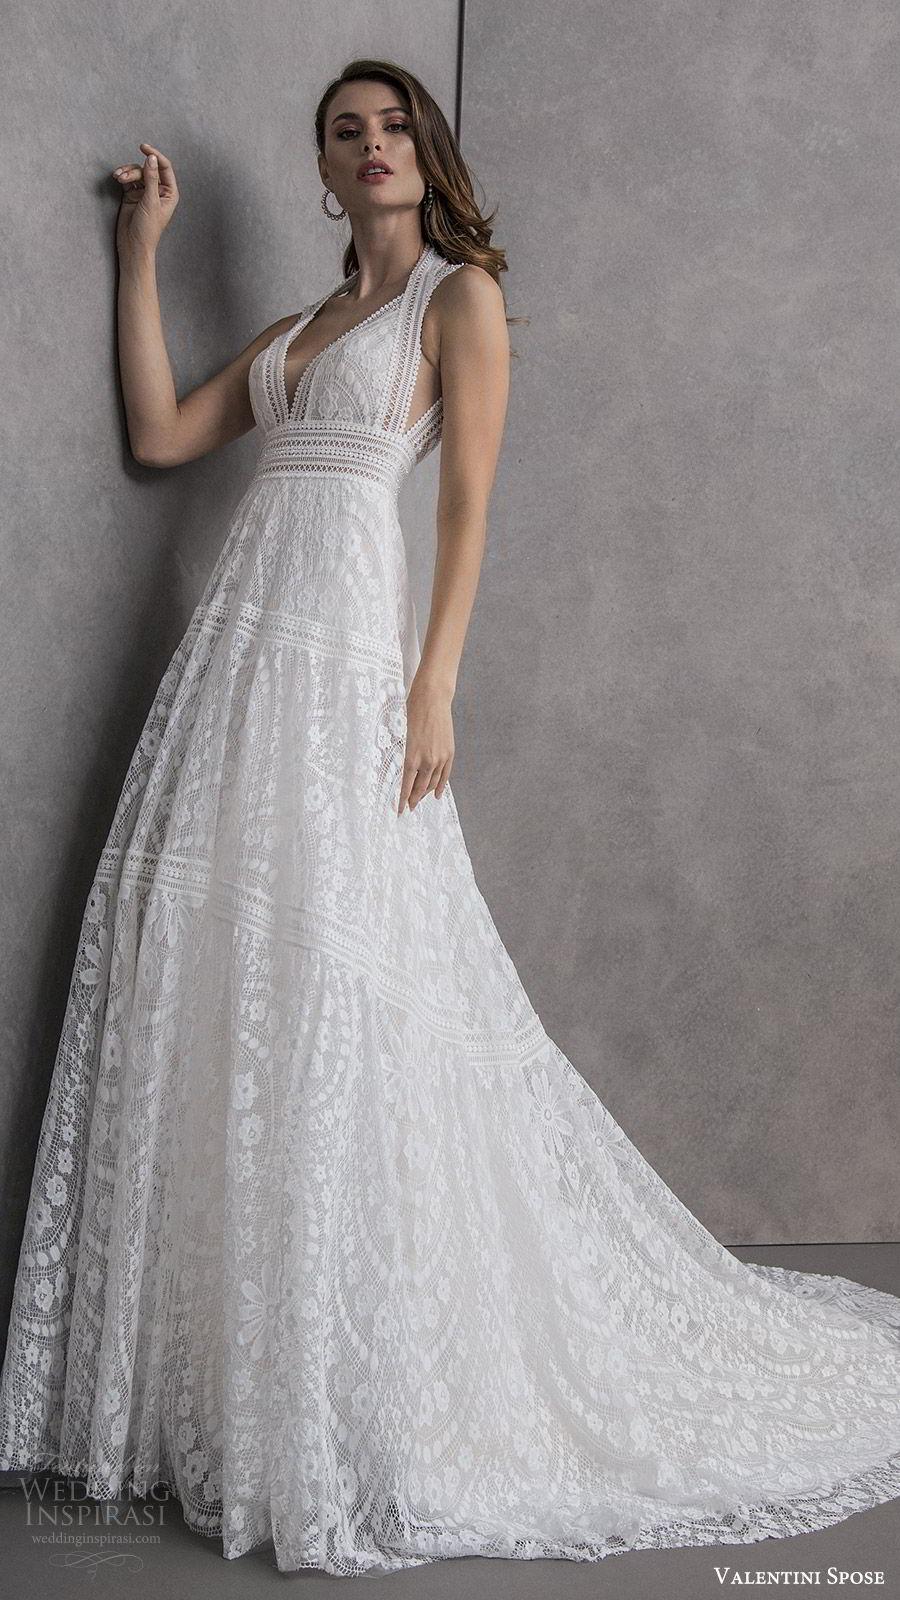 valentini spose spring 2020 bridal sleeveless halter neckline deep v neck fully embellished lace a line wedding dress (12) romantic boho chic chapel train keyhole back mv